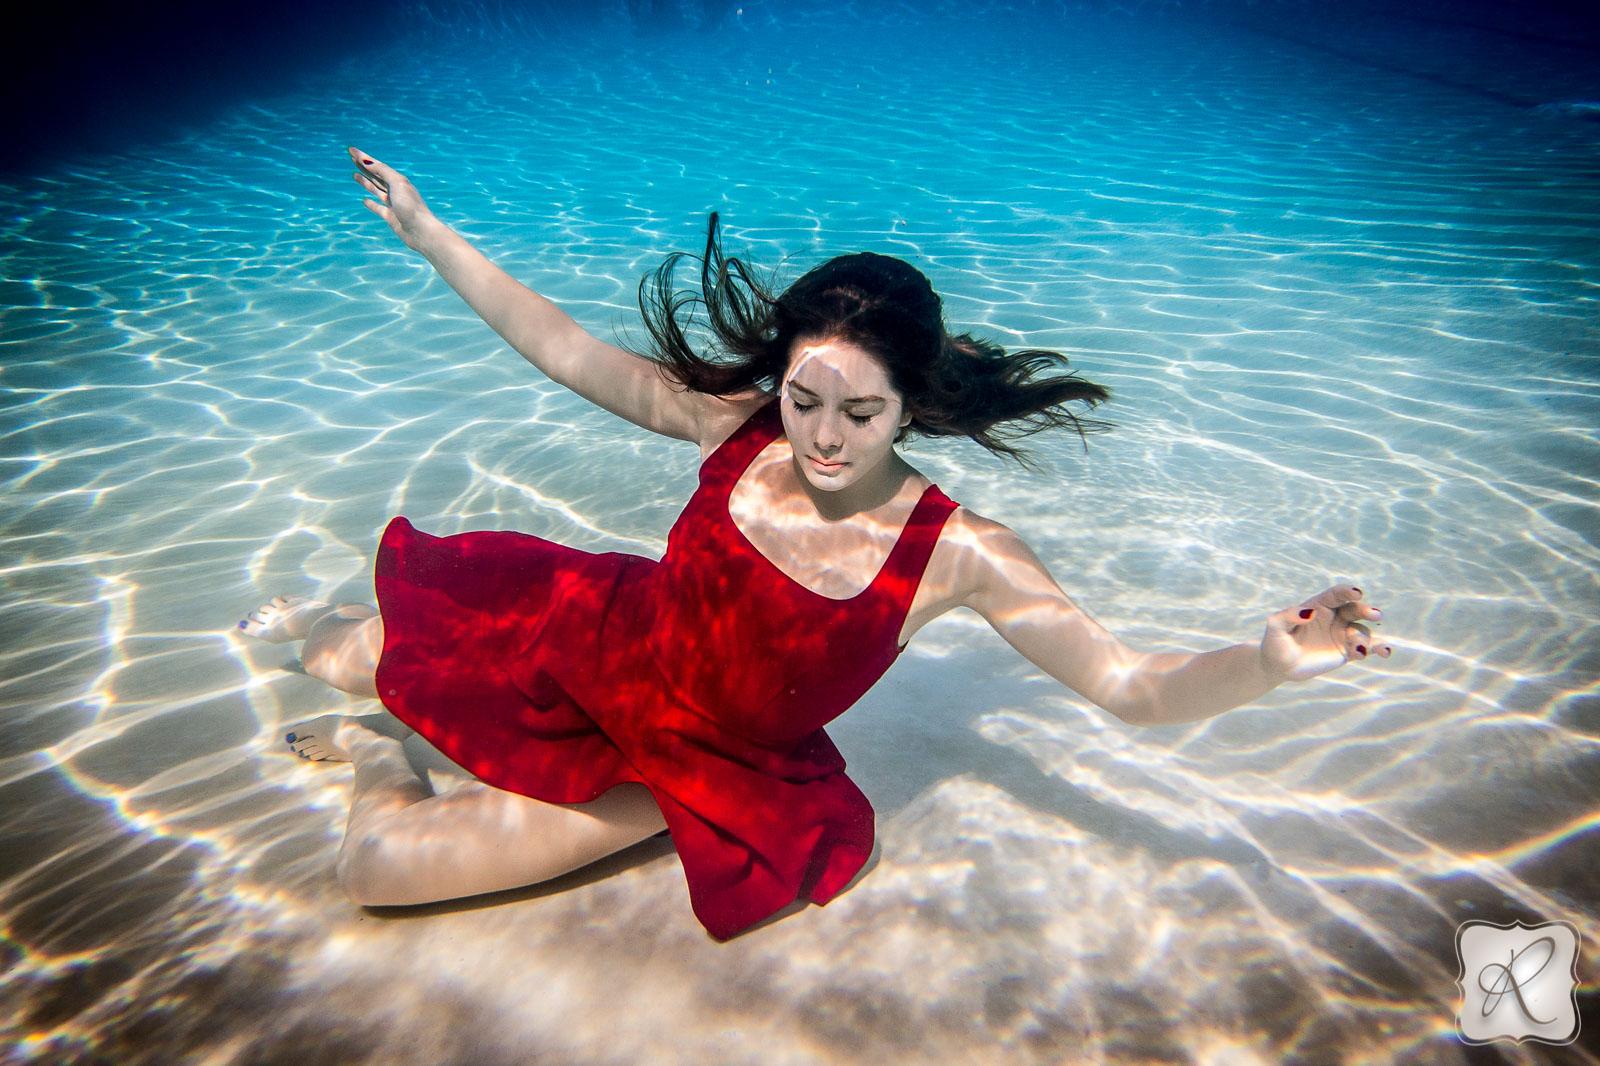 Swimming Portraits